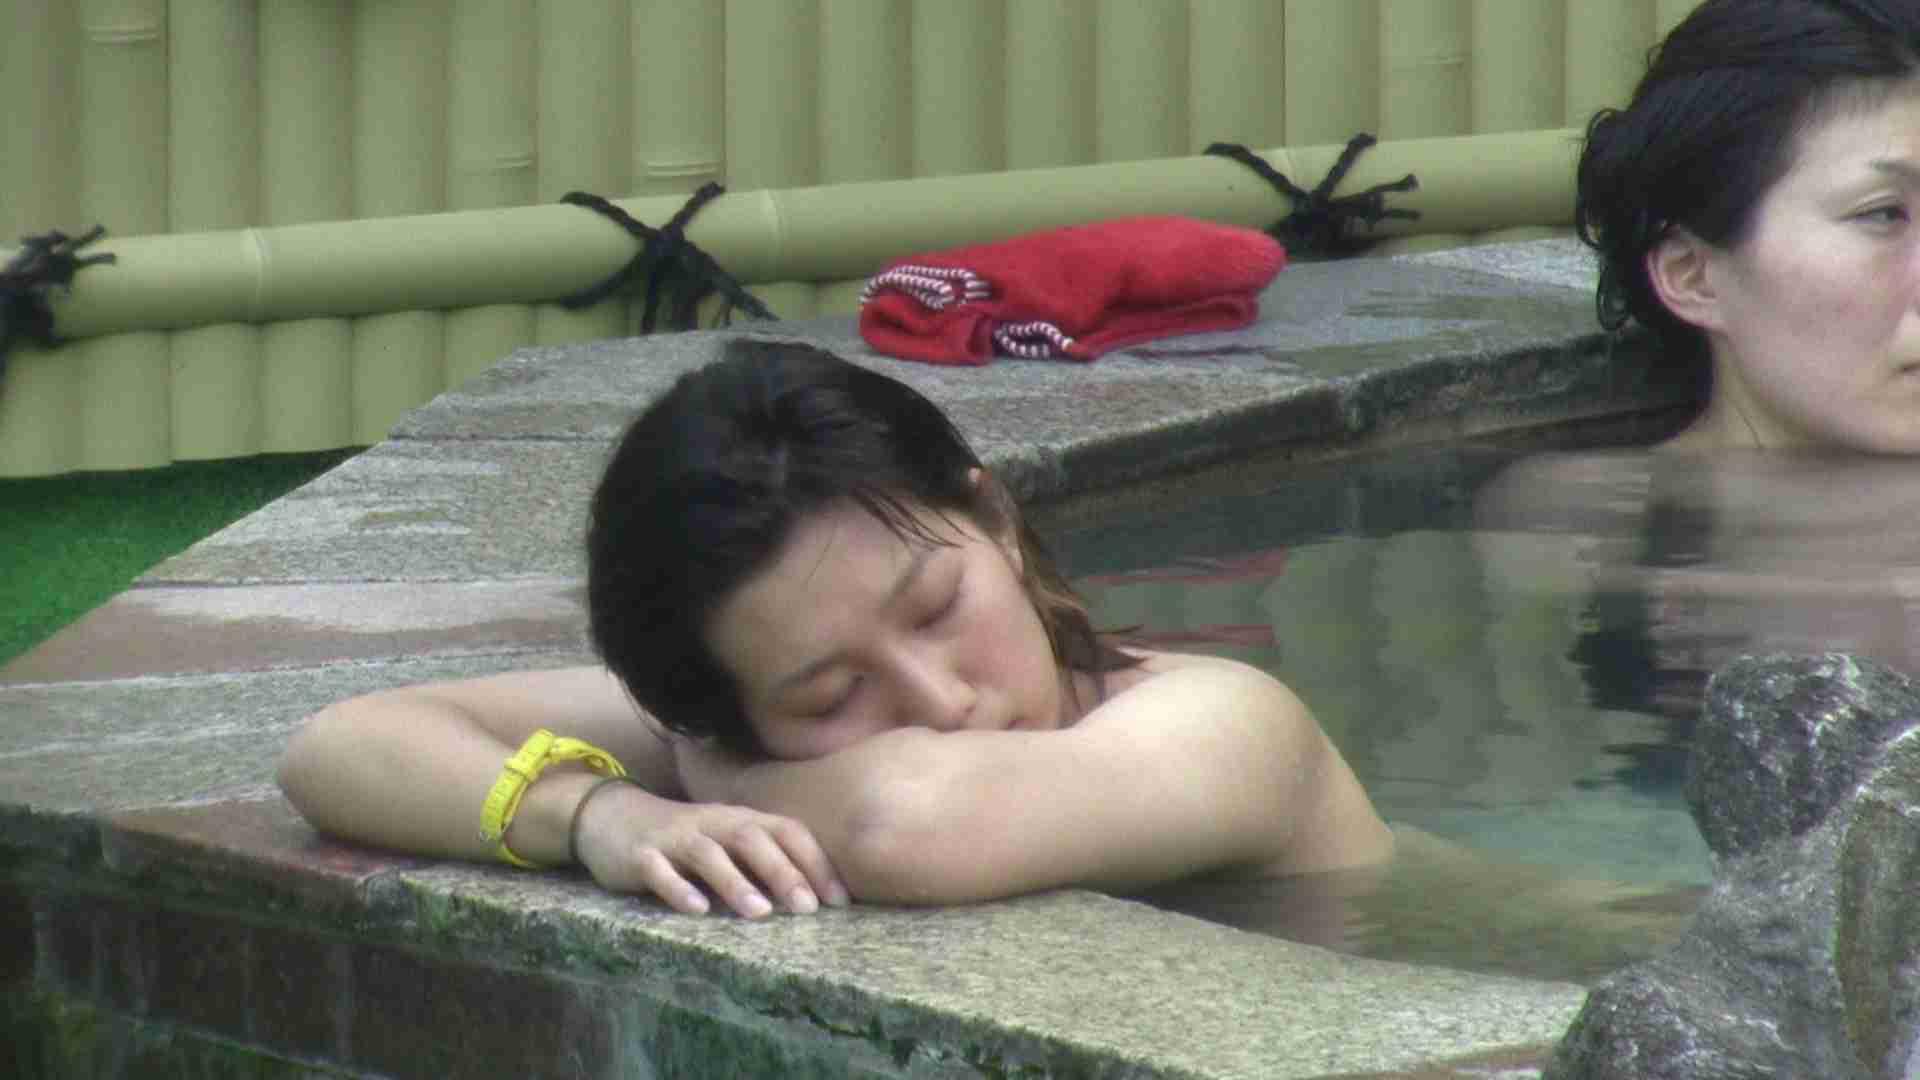 Aquaな露天風呂Vol.132 盗撮映像  31Pix 27